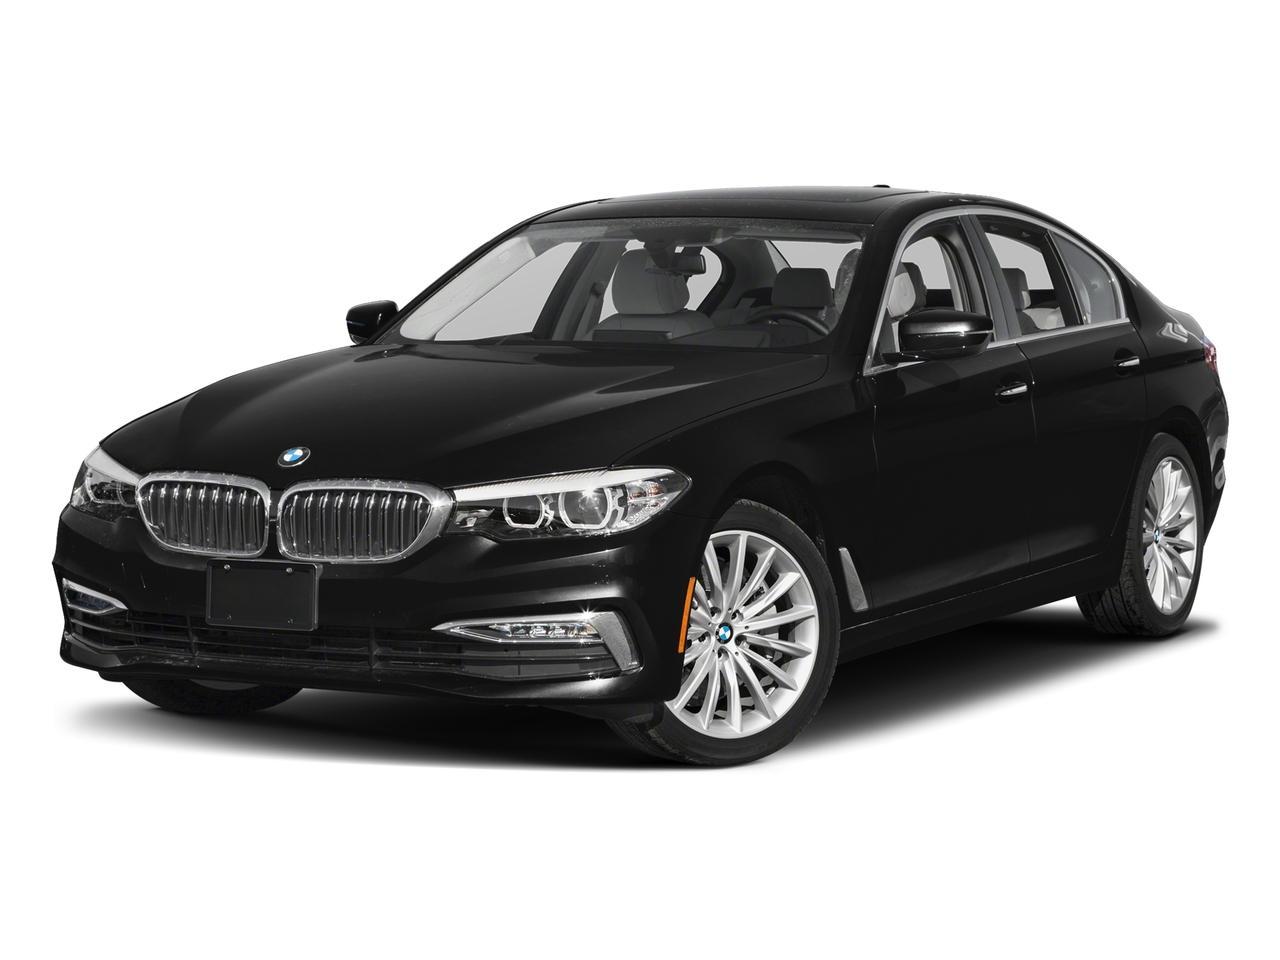 2017 BMW 530i Vehicle Photo in Grapevine, TX 76051